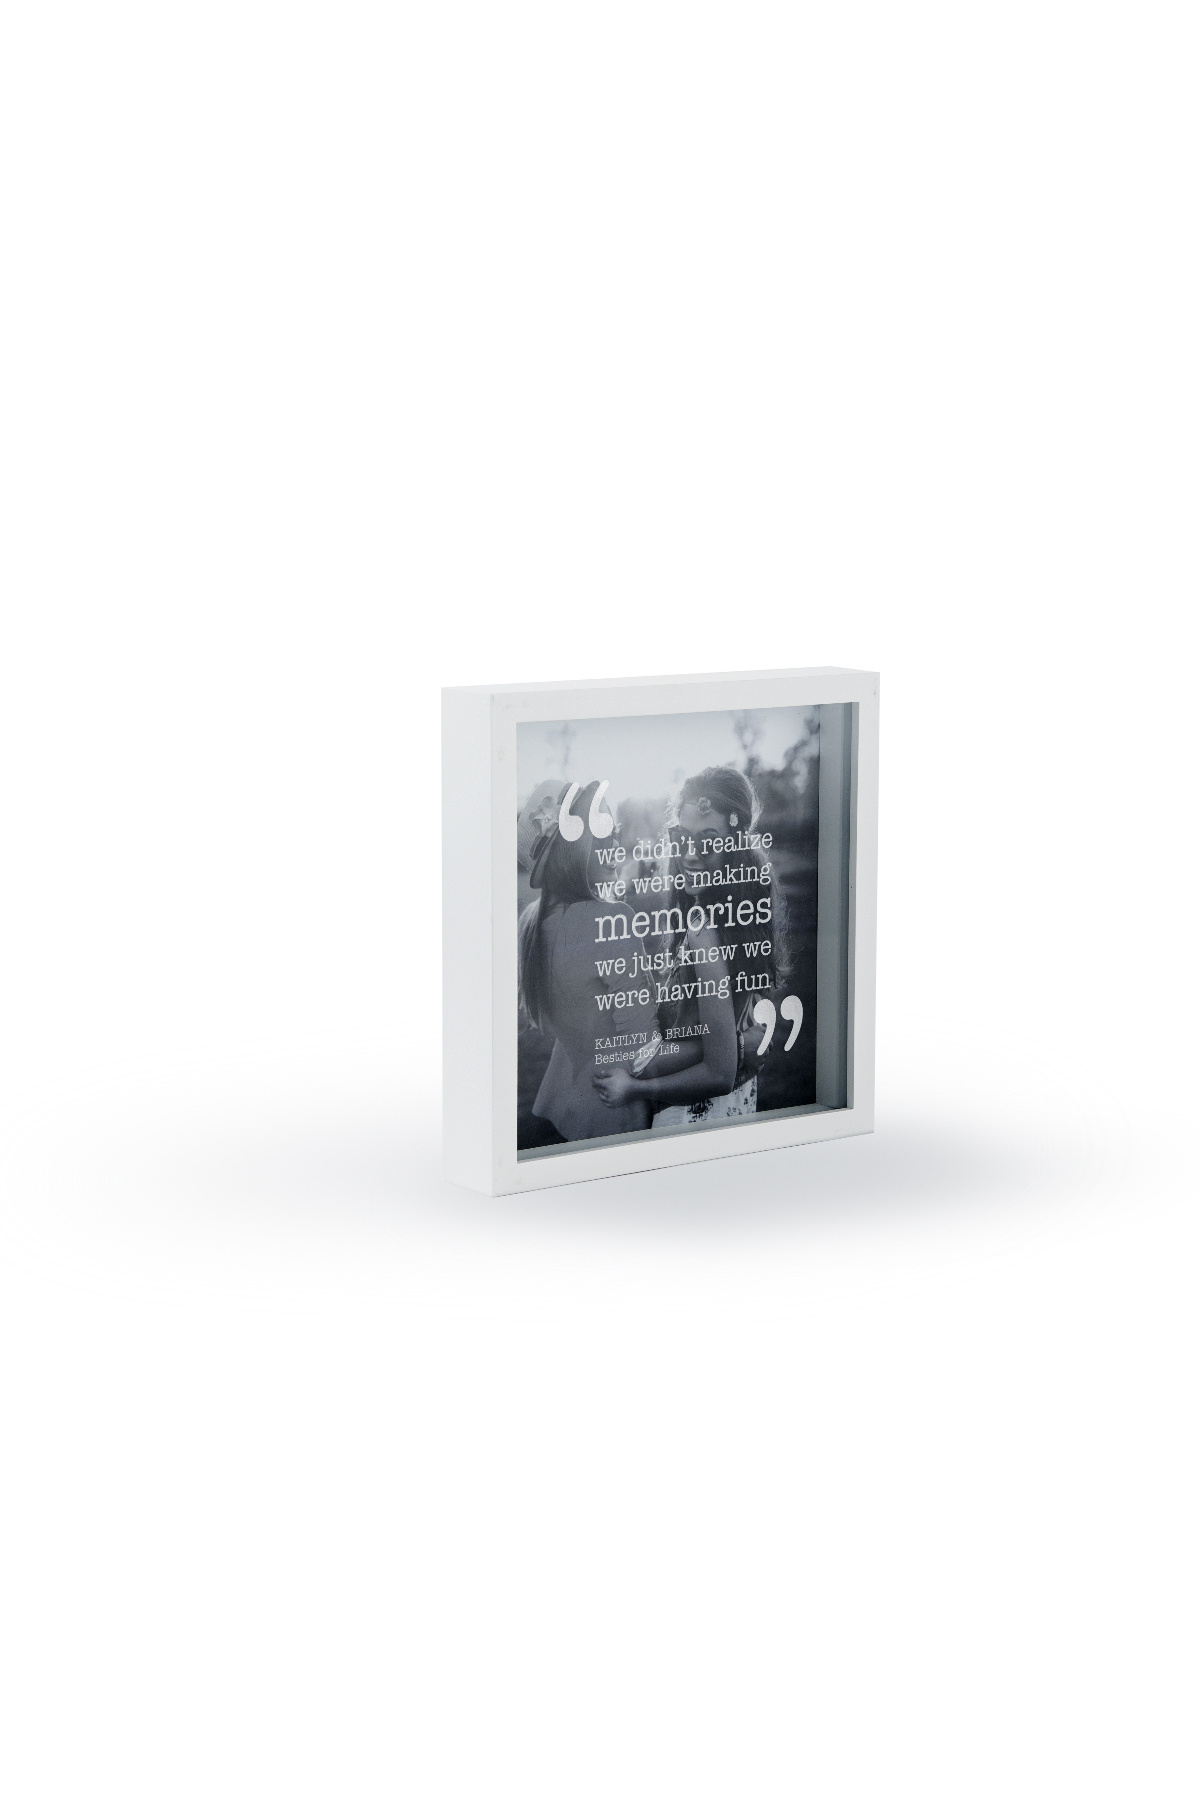 Shadow-Box Frame 25 x 25 cm White or Black | eBay